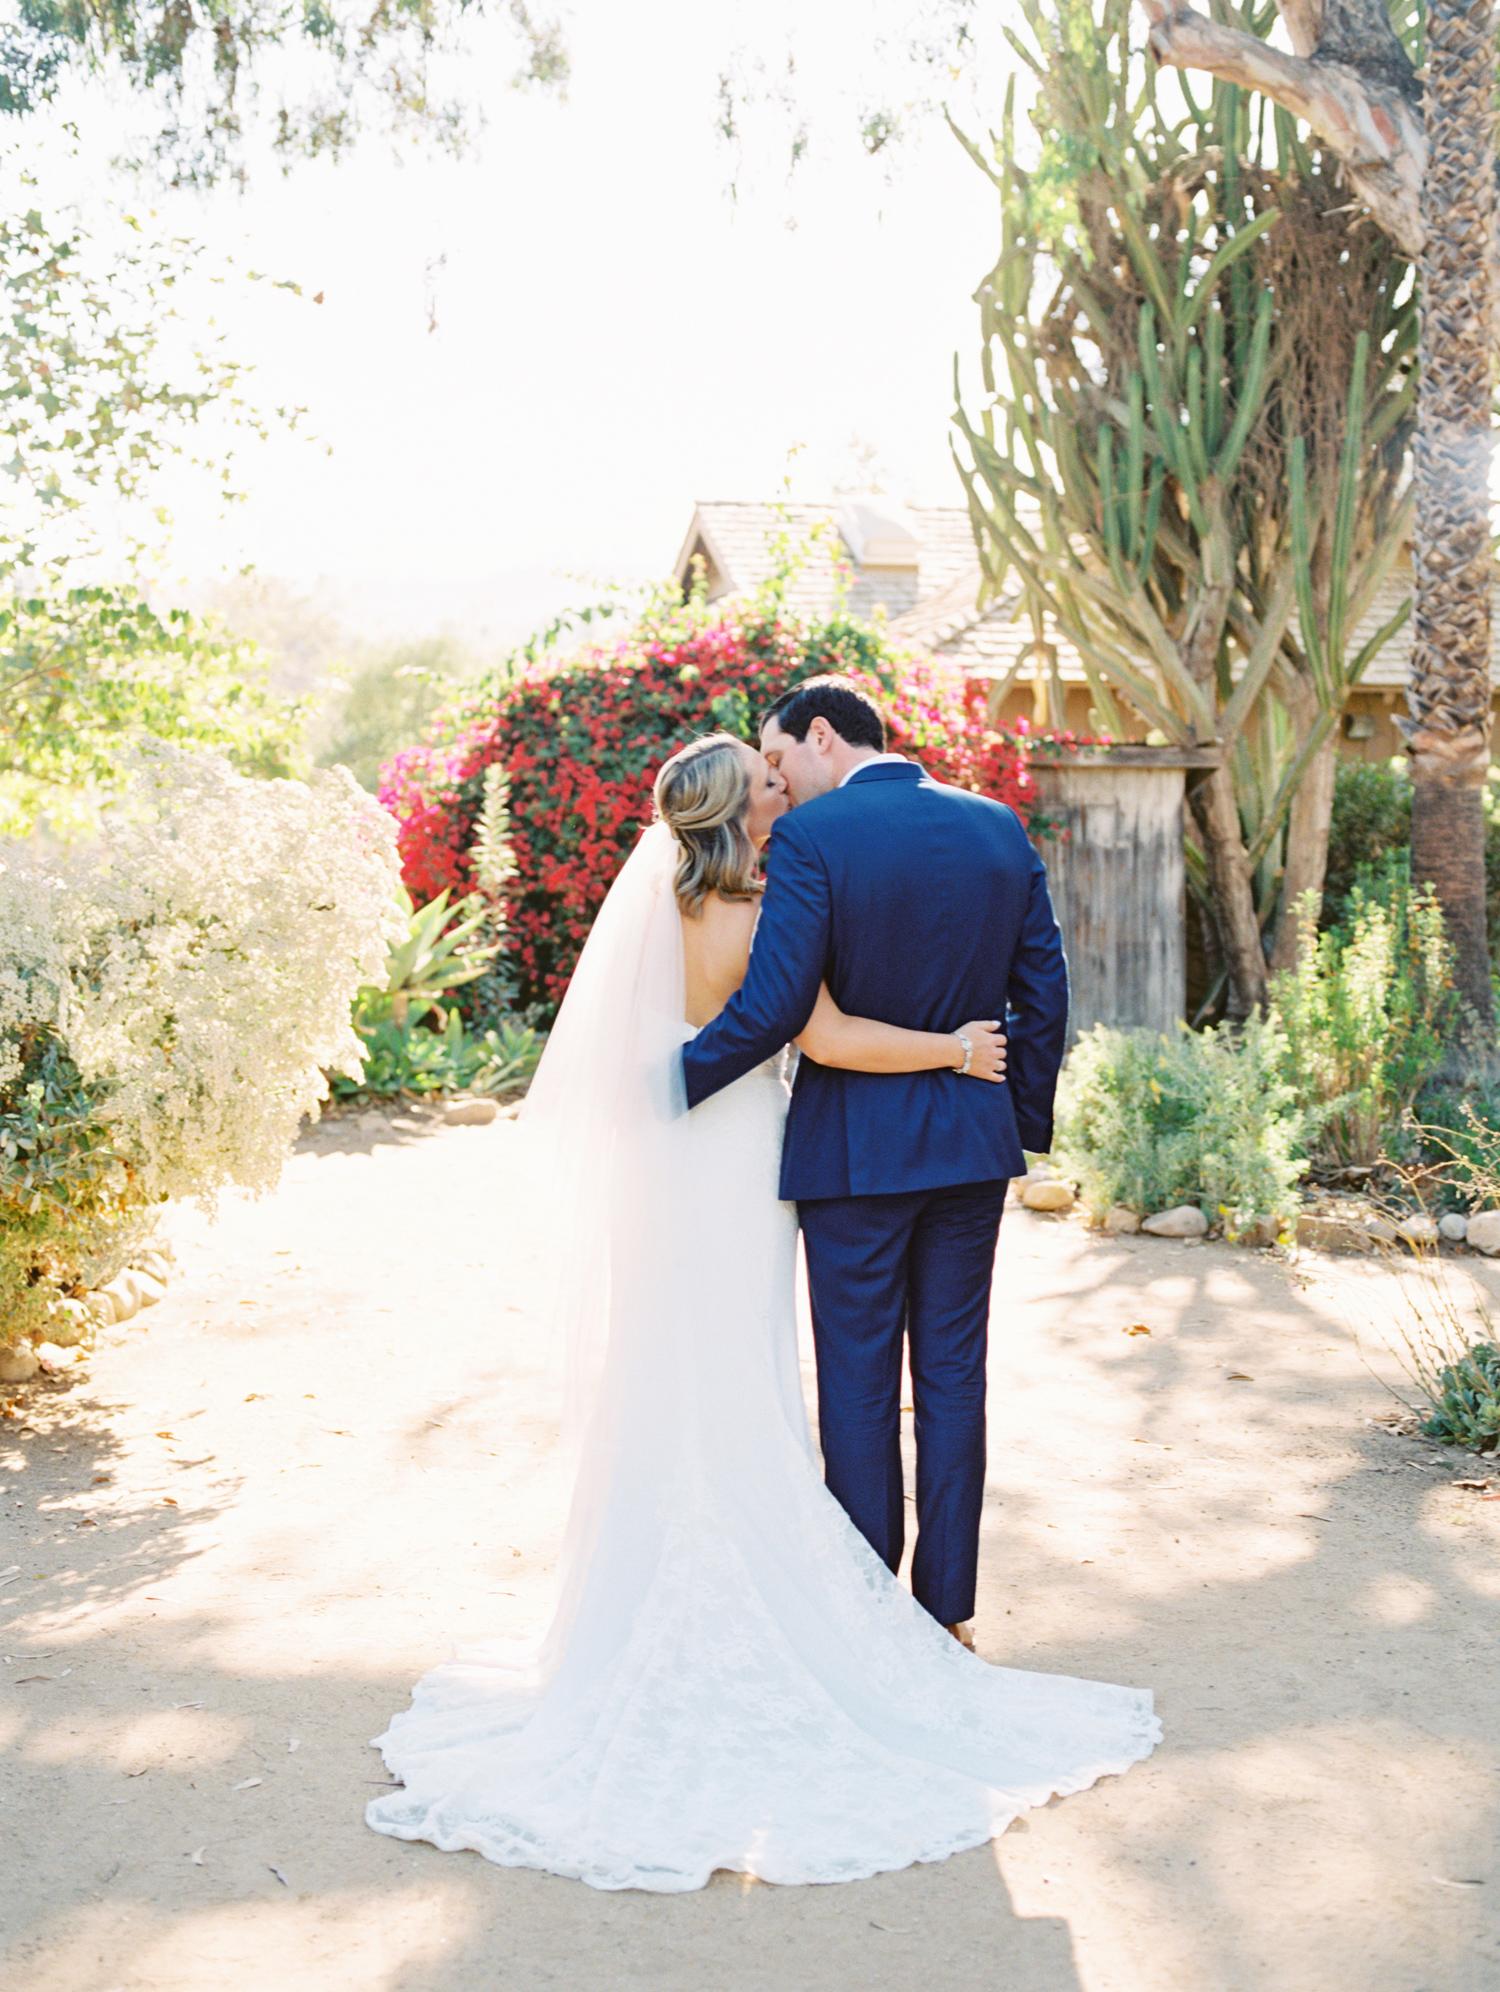 063-Jen-Wojcik-Photography-San-Diego-Wedding-Photographer.jpg